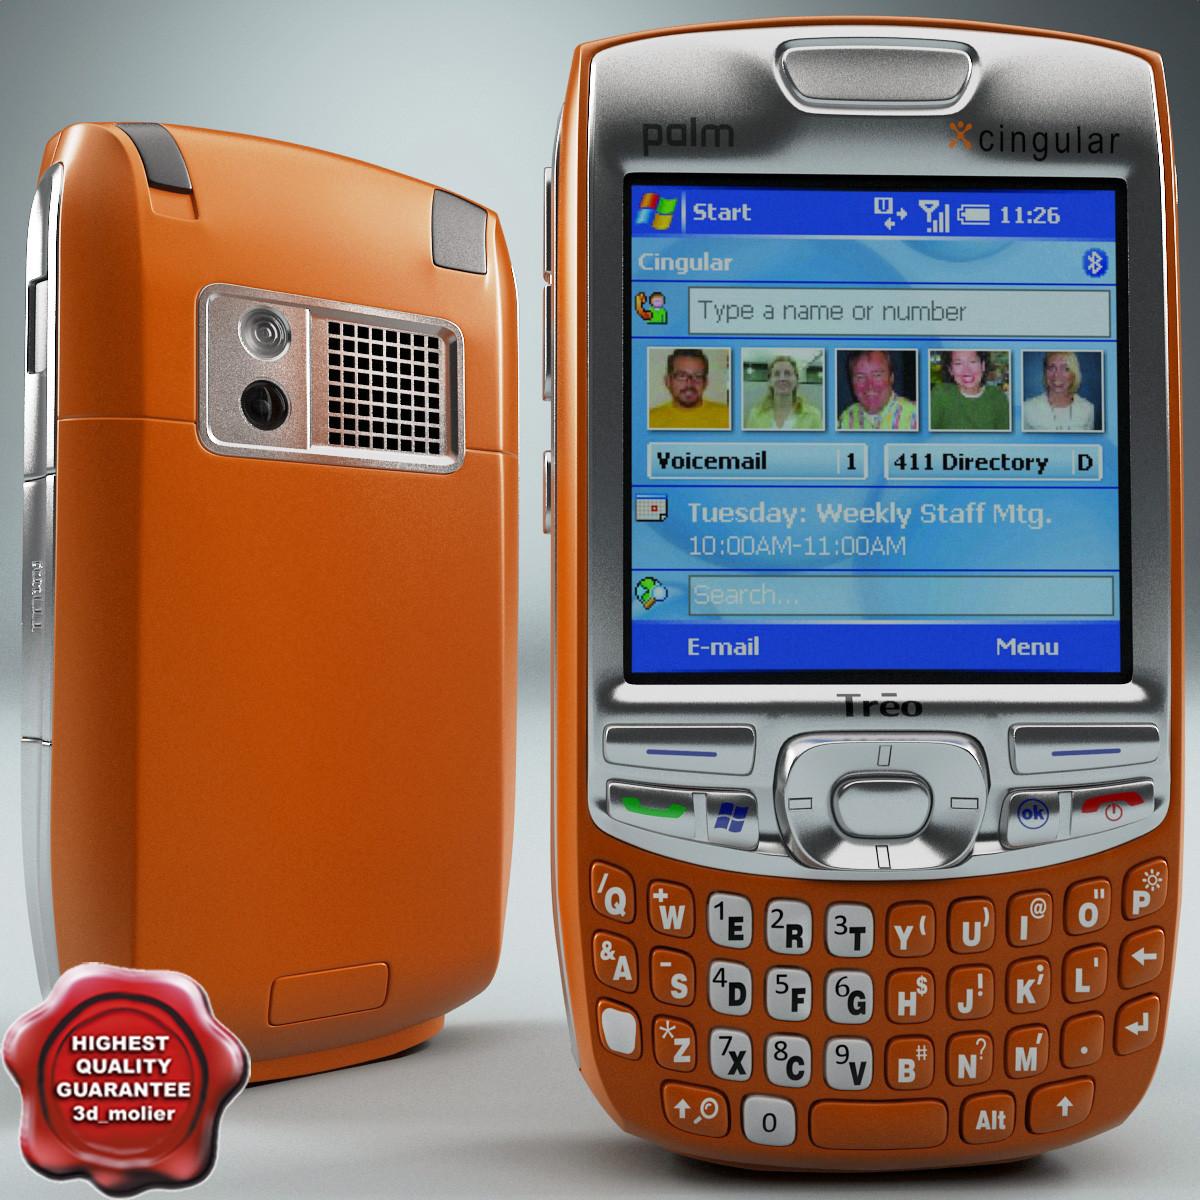 3d palm treo 750 orange